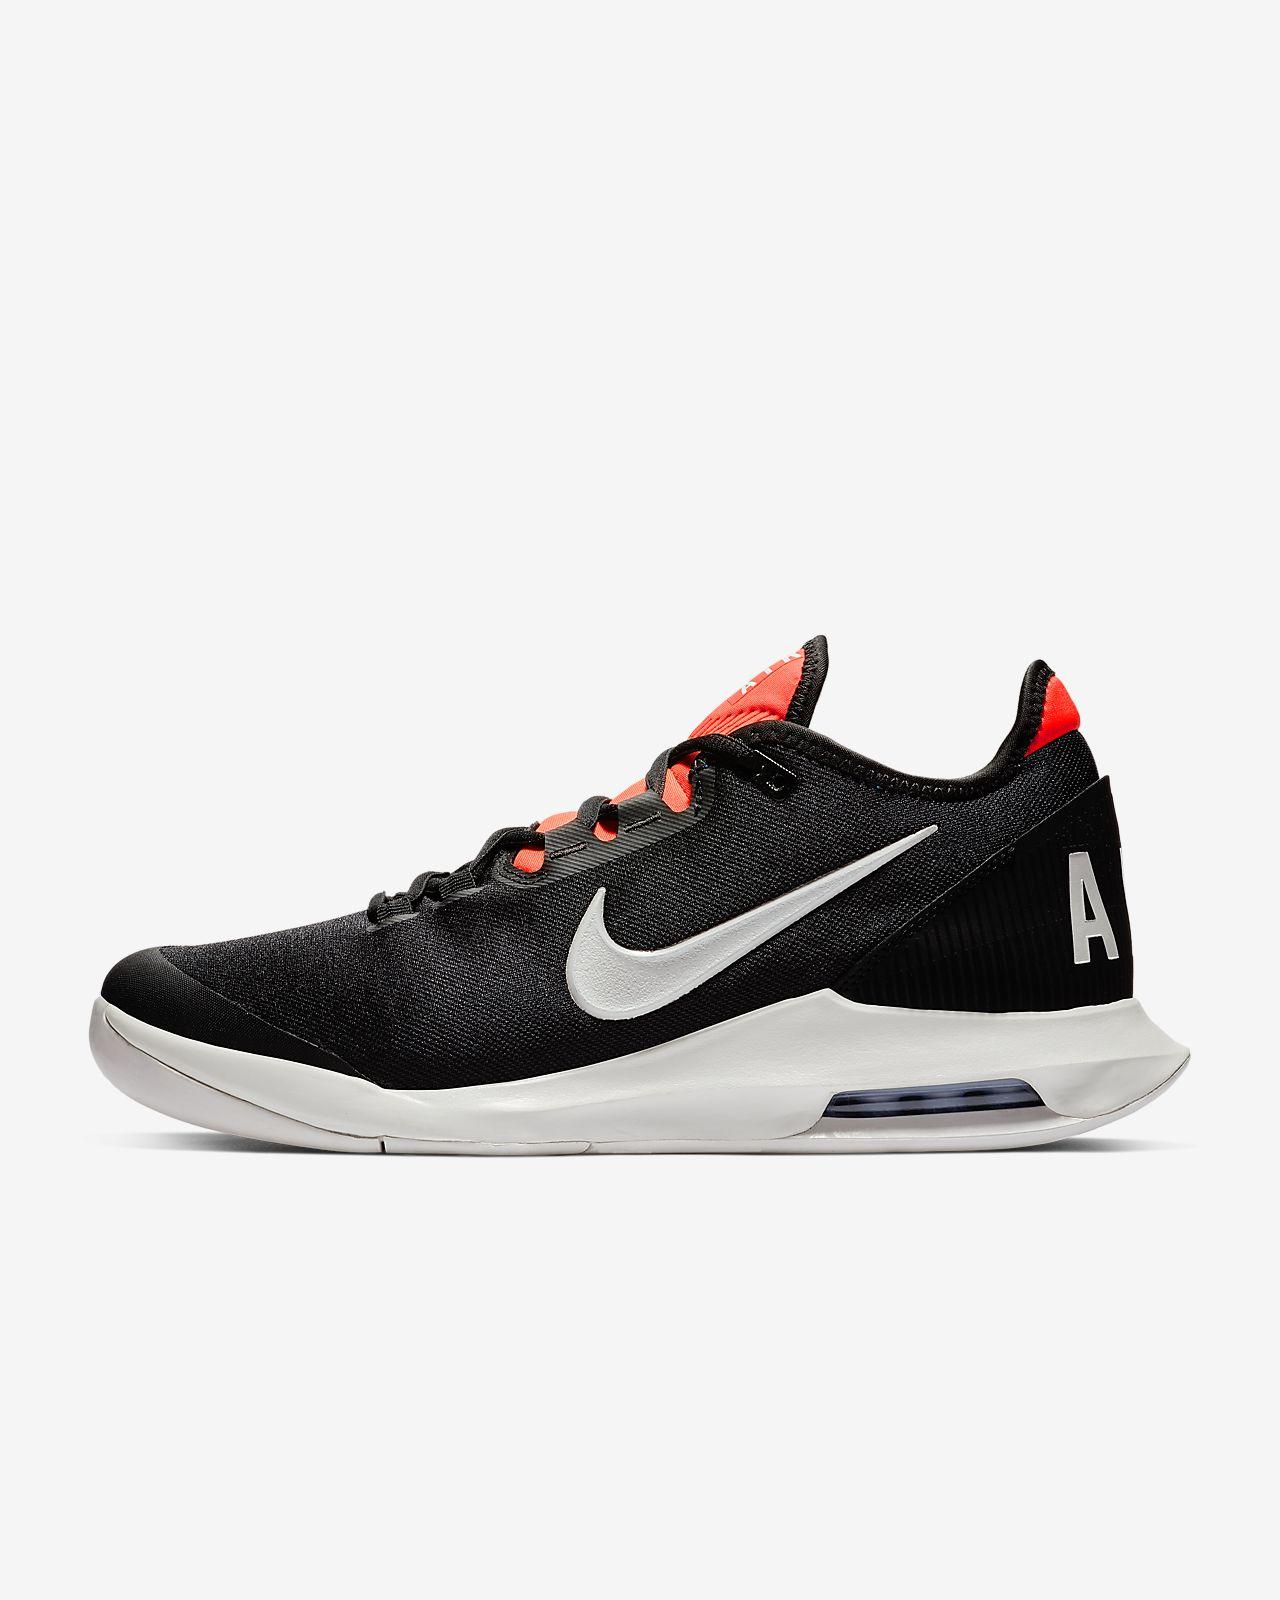 check out 11ec1 6fb39 Calzado de tenis para hombre NikeCourt Air Max Wildcard